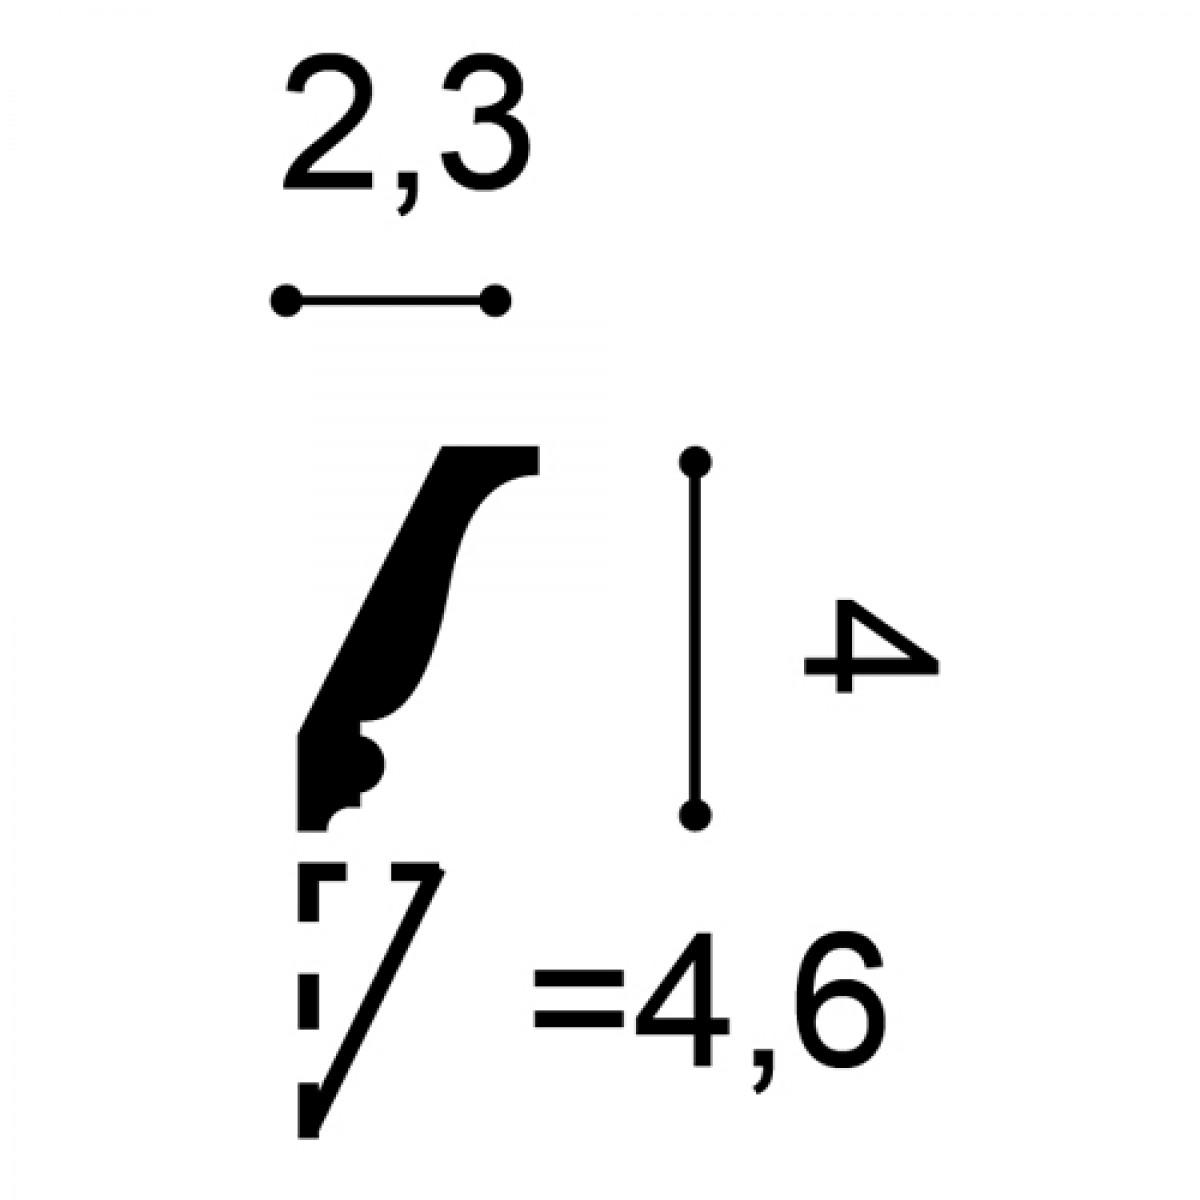 Cornisa Axxent CX151, Dimensiuni: 200 X 4 X 2.3 cm, Orac Decor